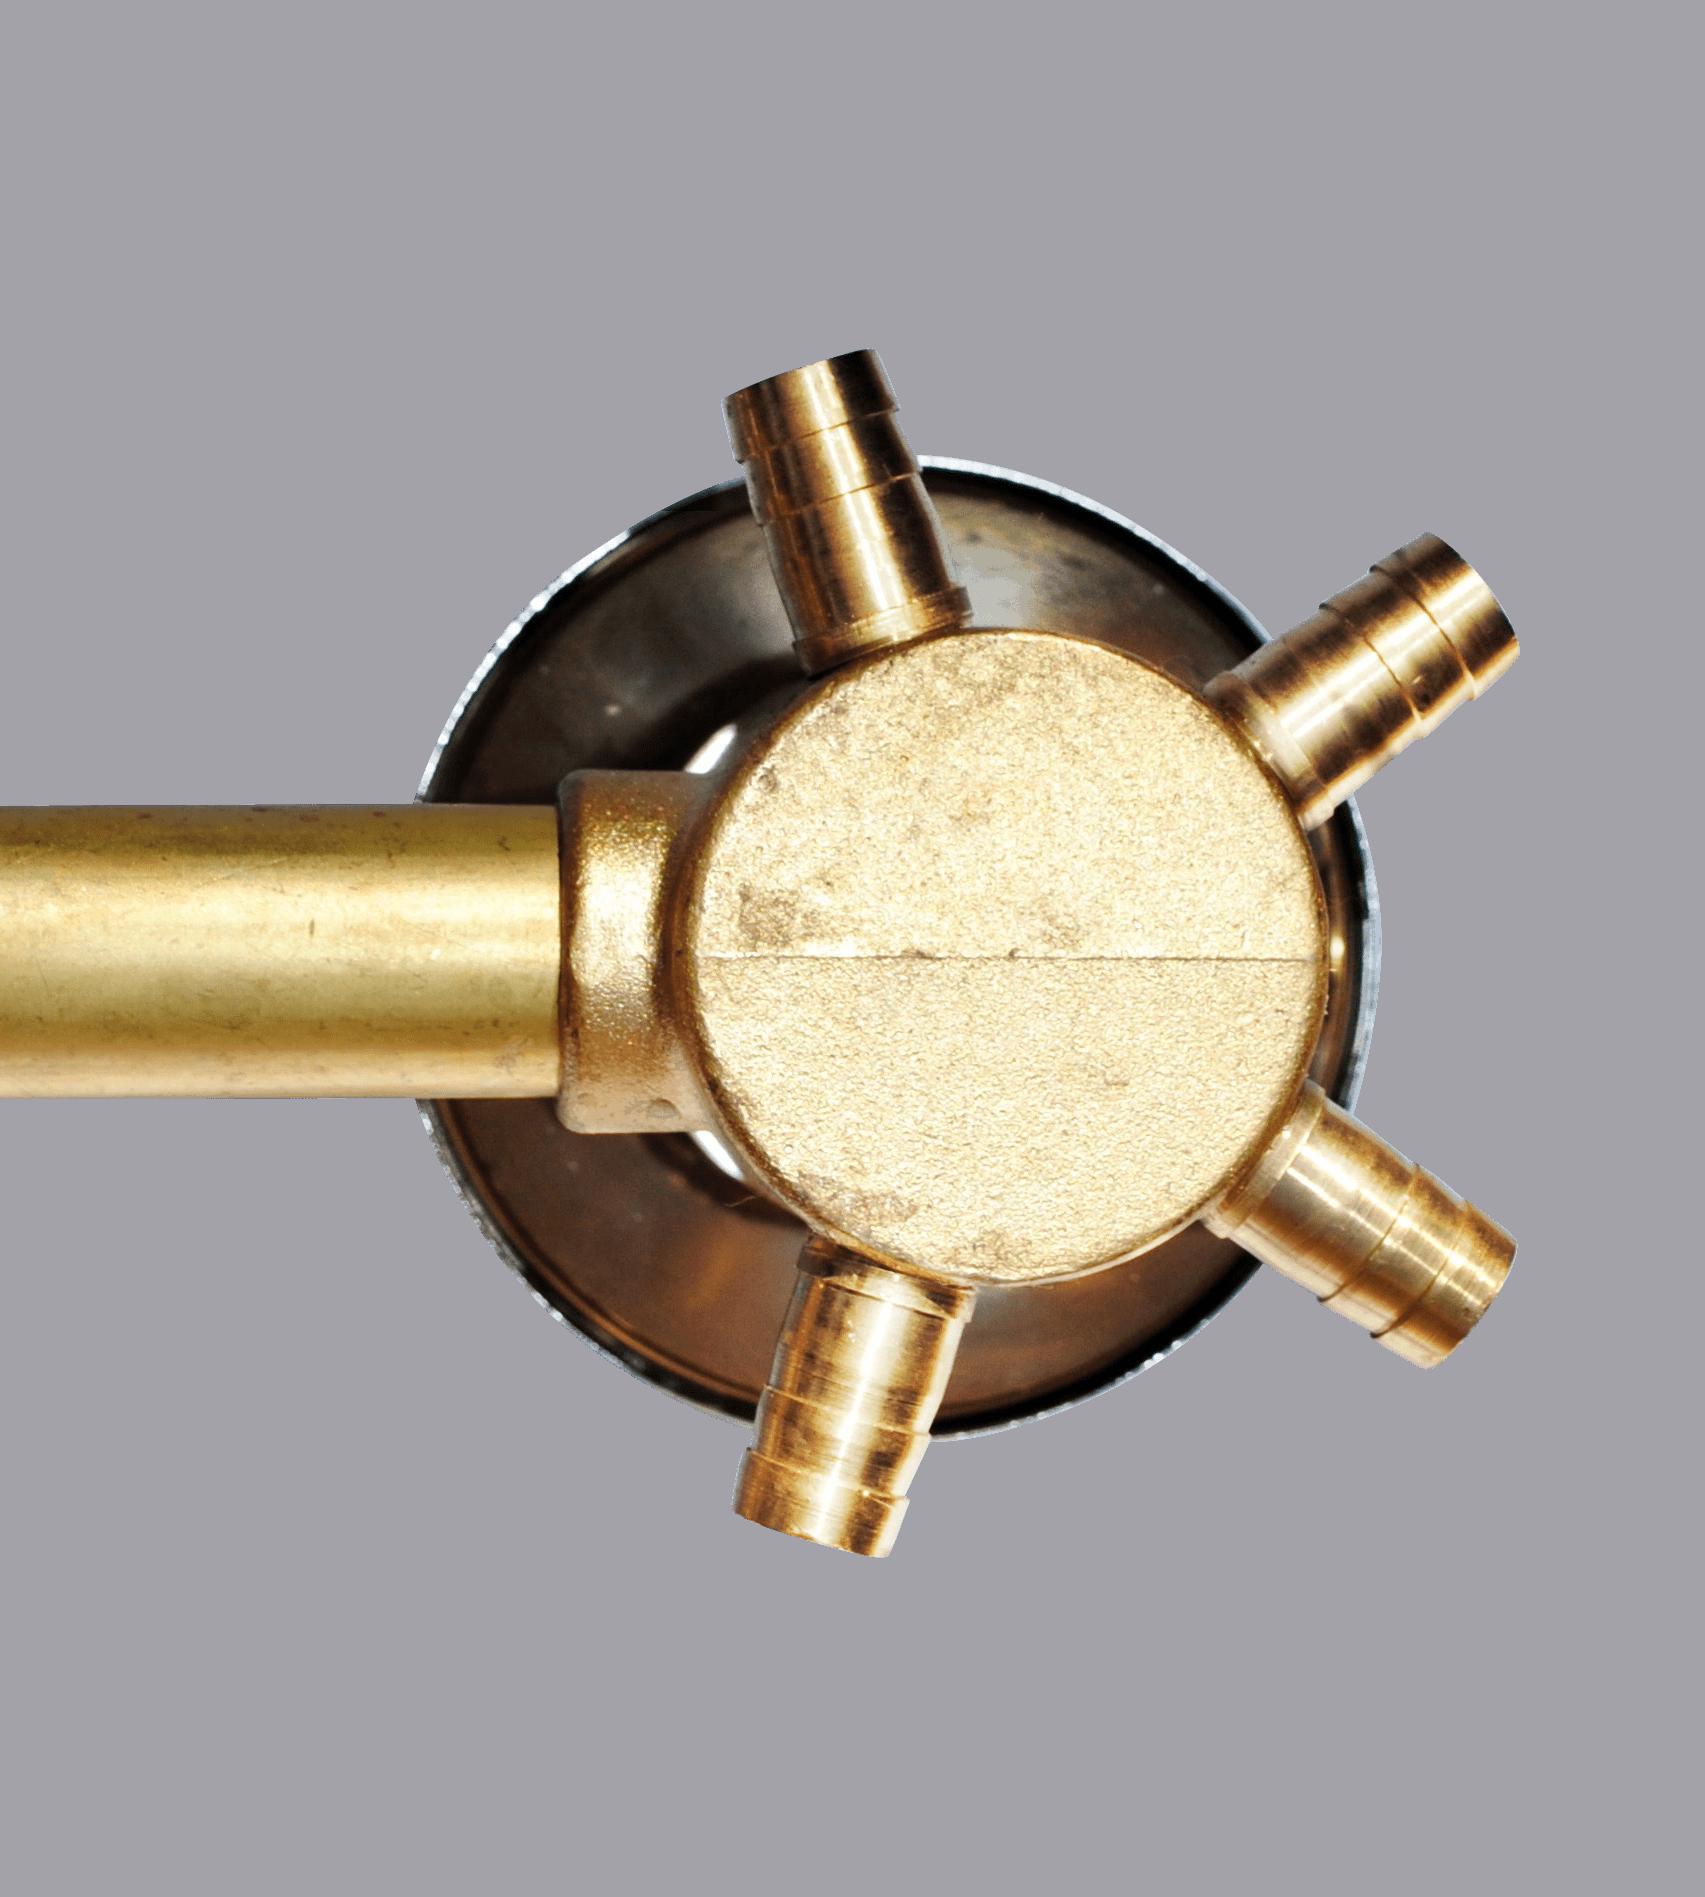 2 Dial Shower Mixer Valve 100mm Centres: 2,3,4 & 5 Outputs